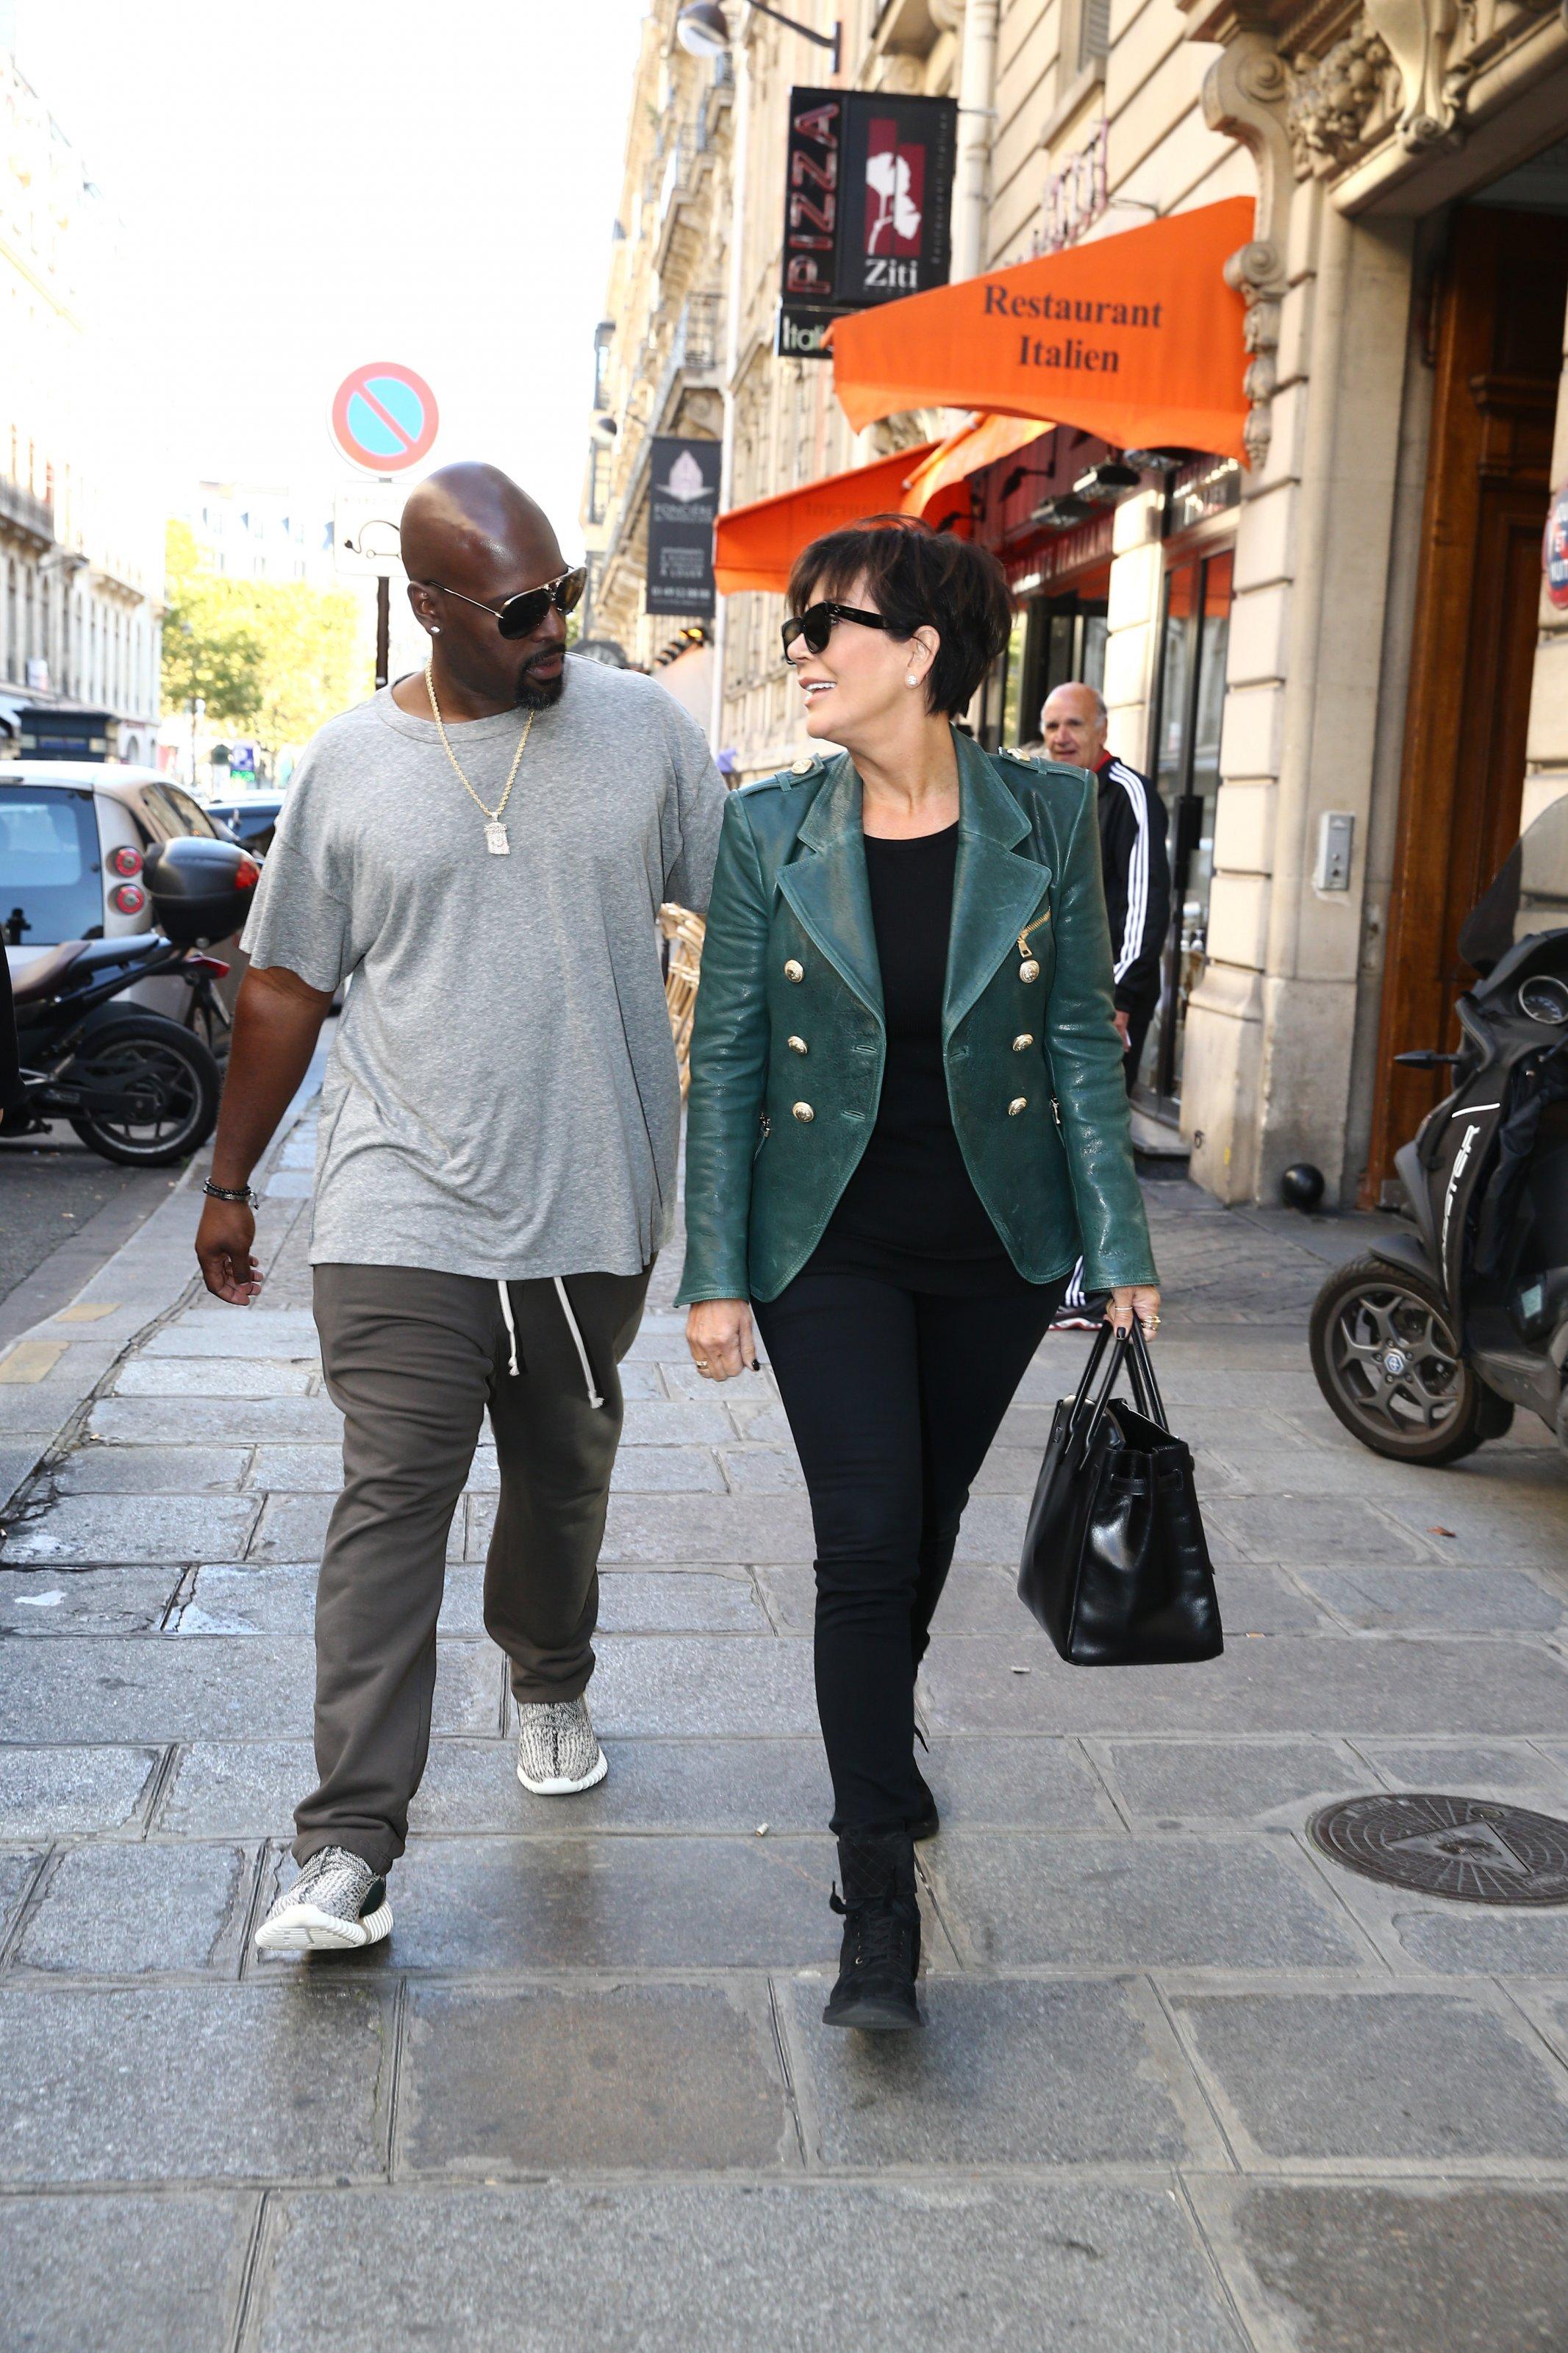 Kendall Jenner, Kris Jenner and her boyfriend Corey Gamble leaving Balmain showroom in Paris, France on September 30, 2015. Photo by ABACAPRESS.COM